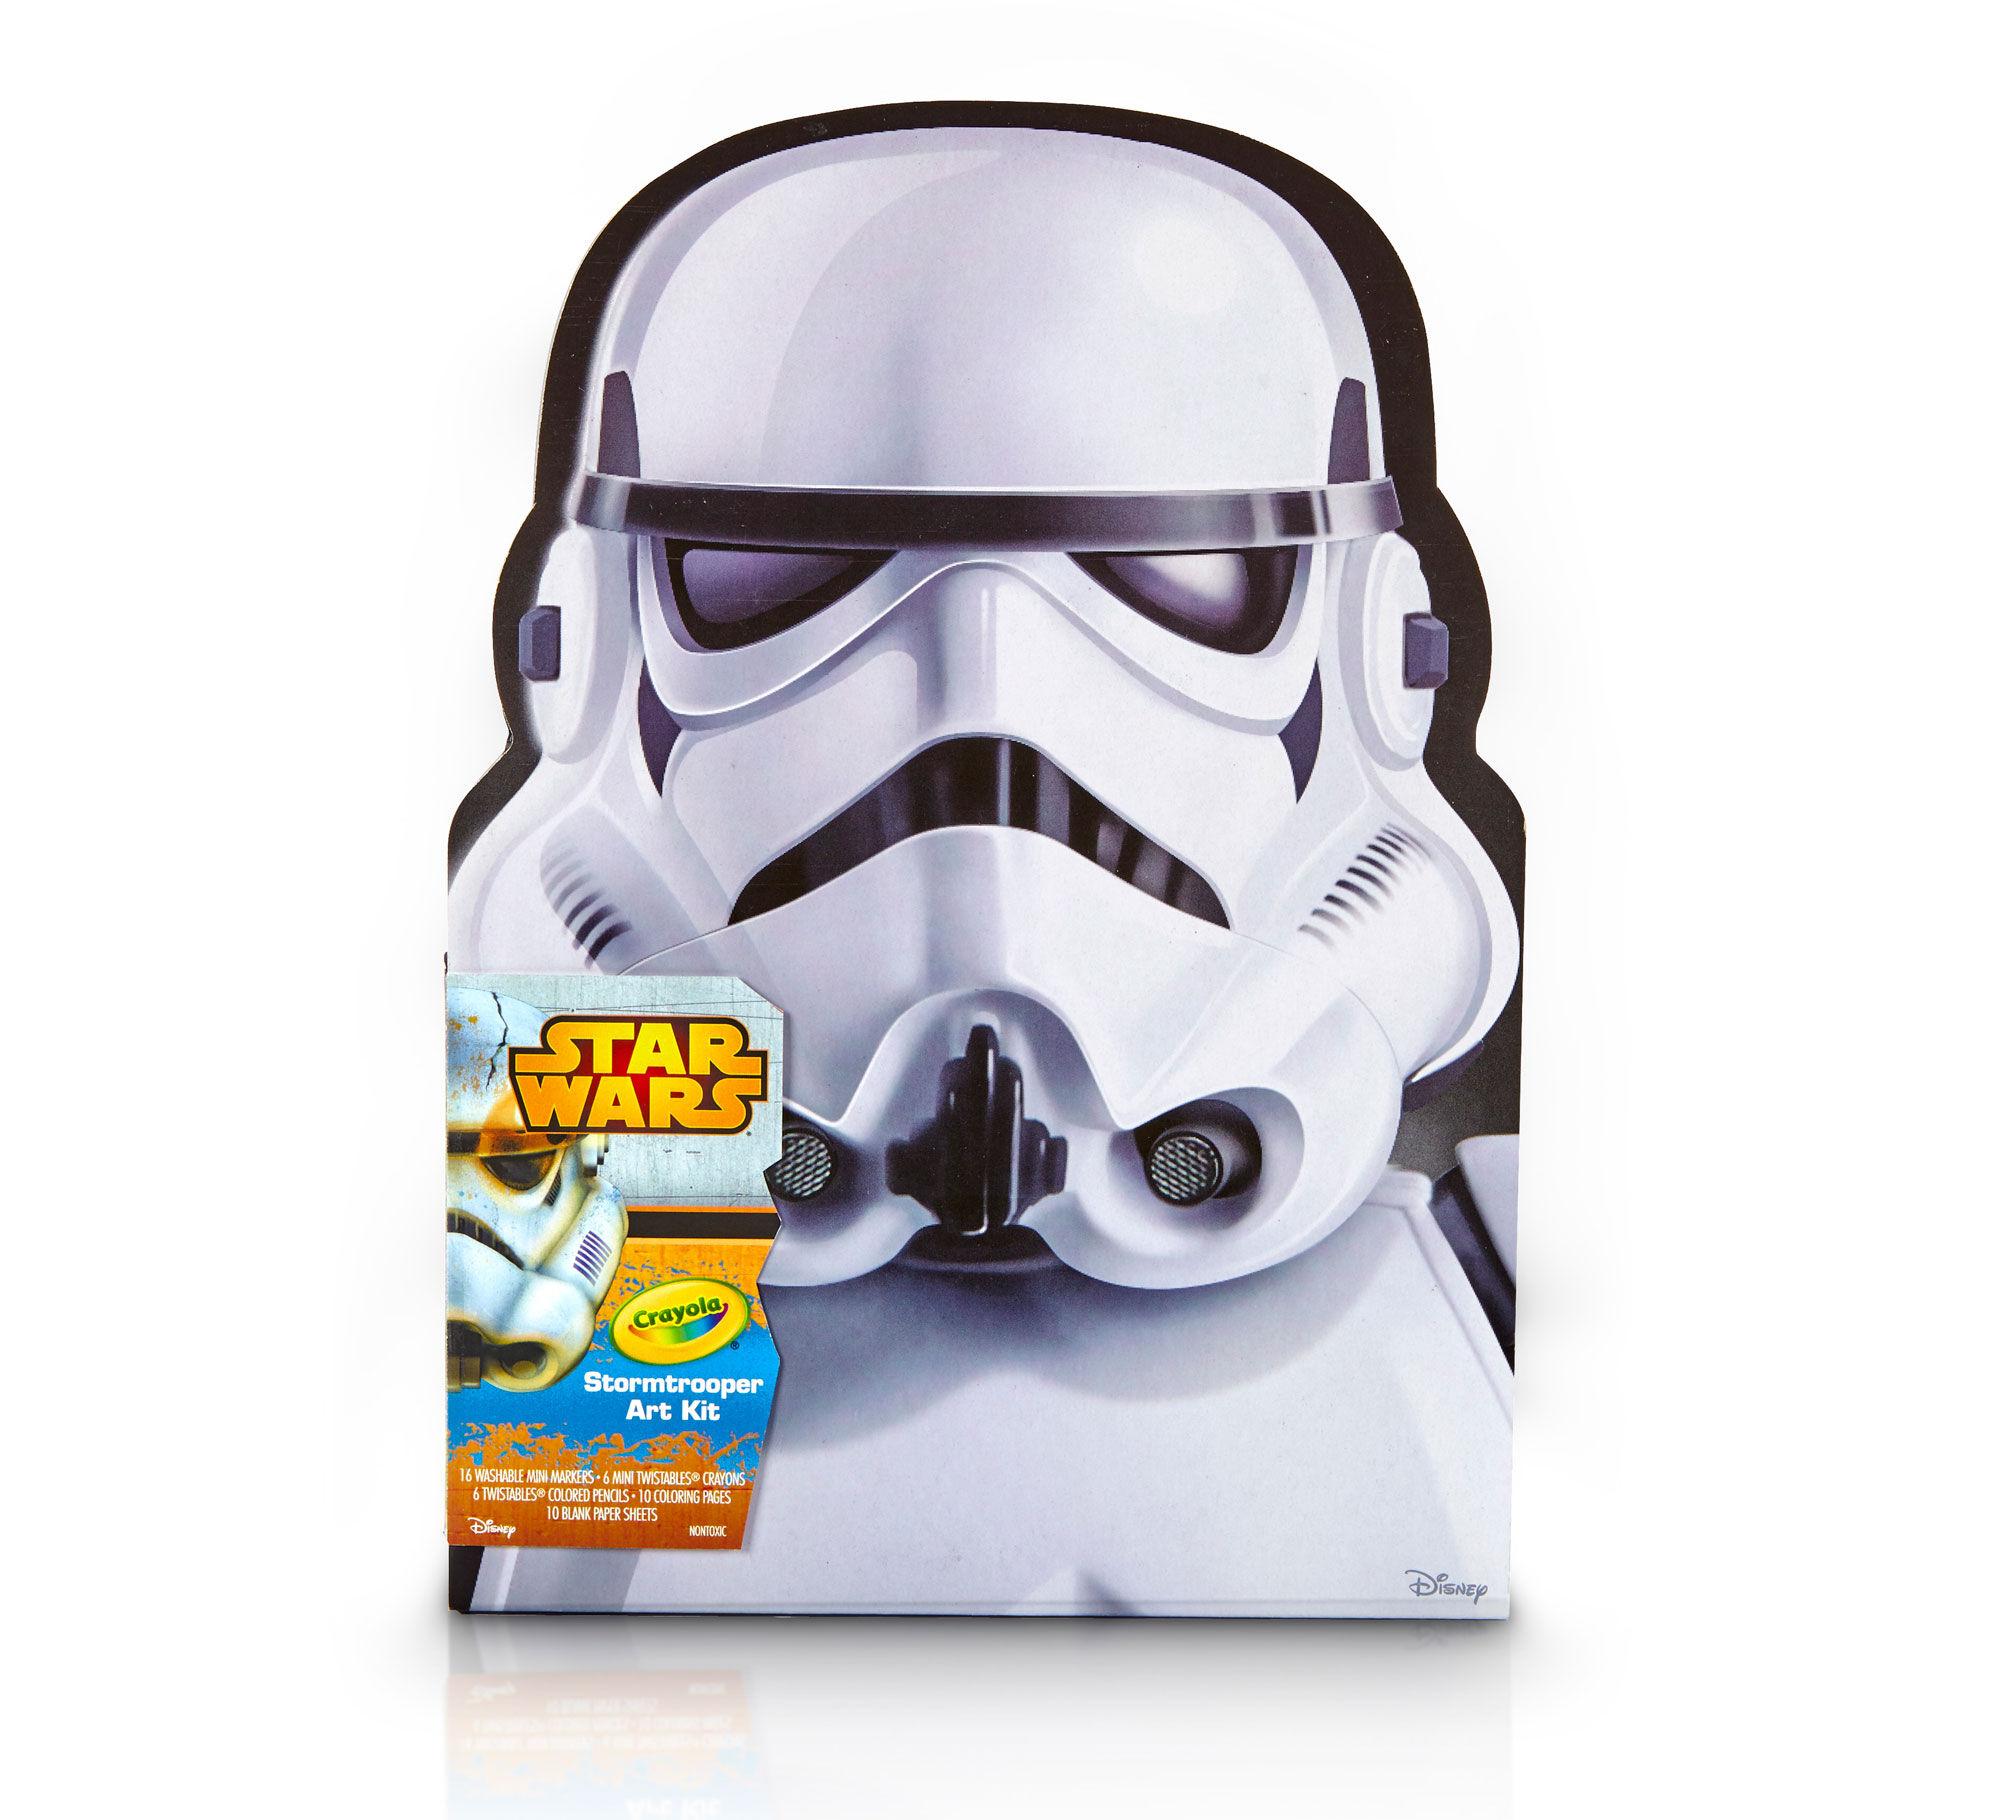 Star Wars Stormtrooper Art Case